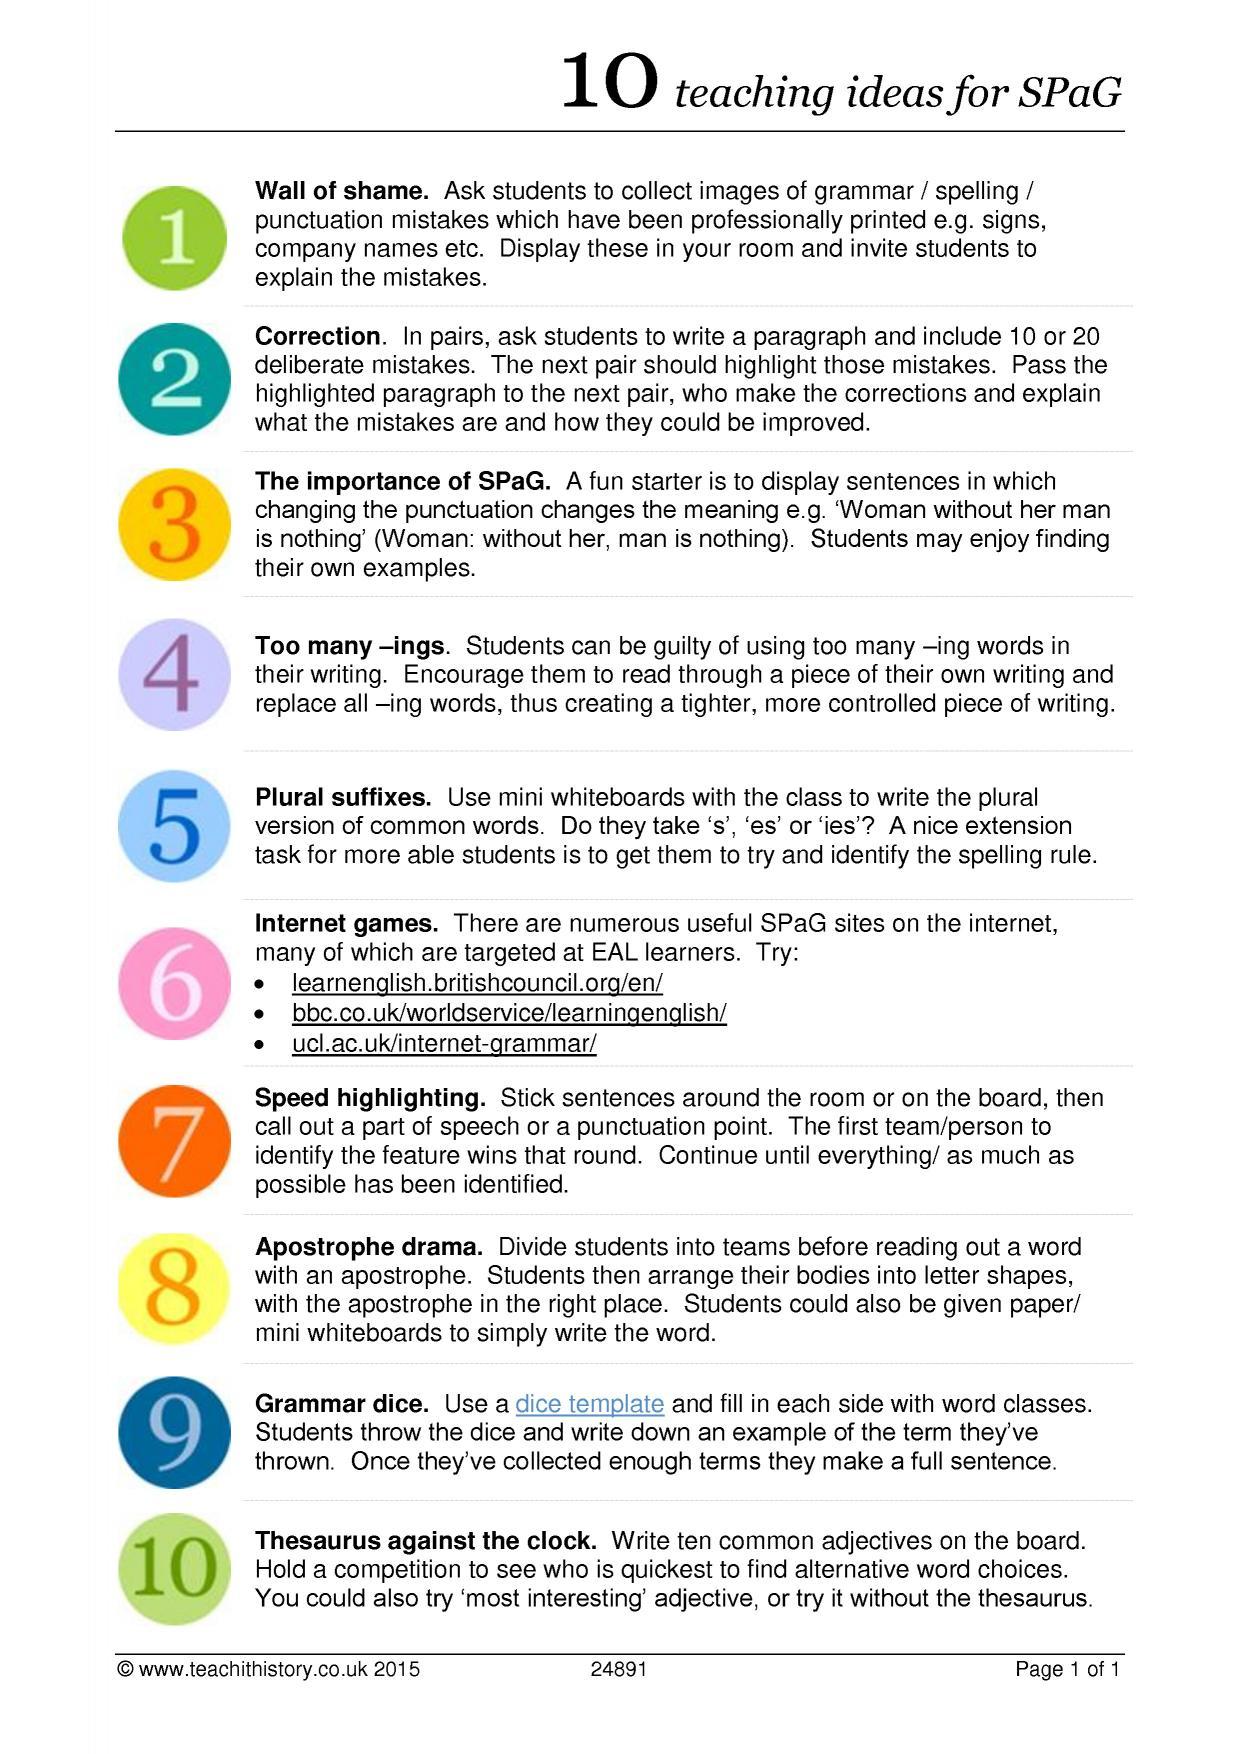 10 Teaching Ideas For Spag